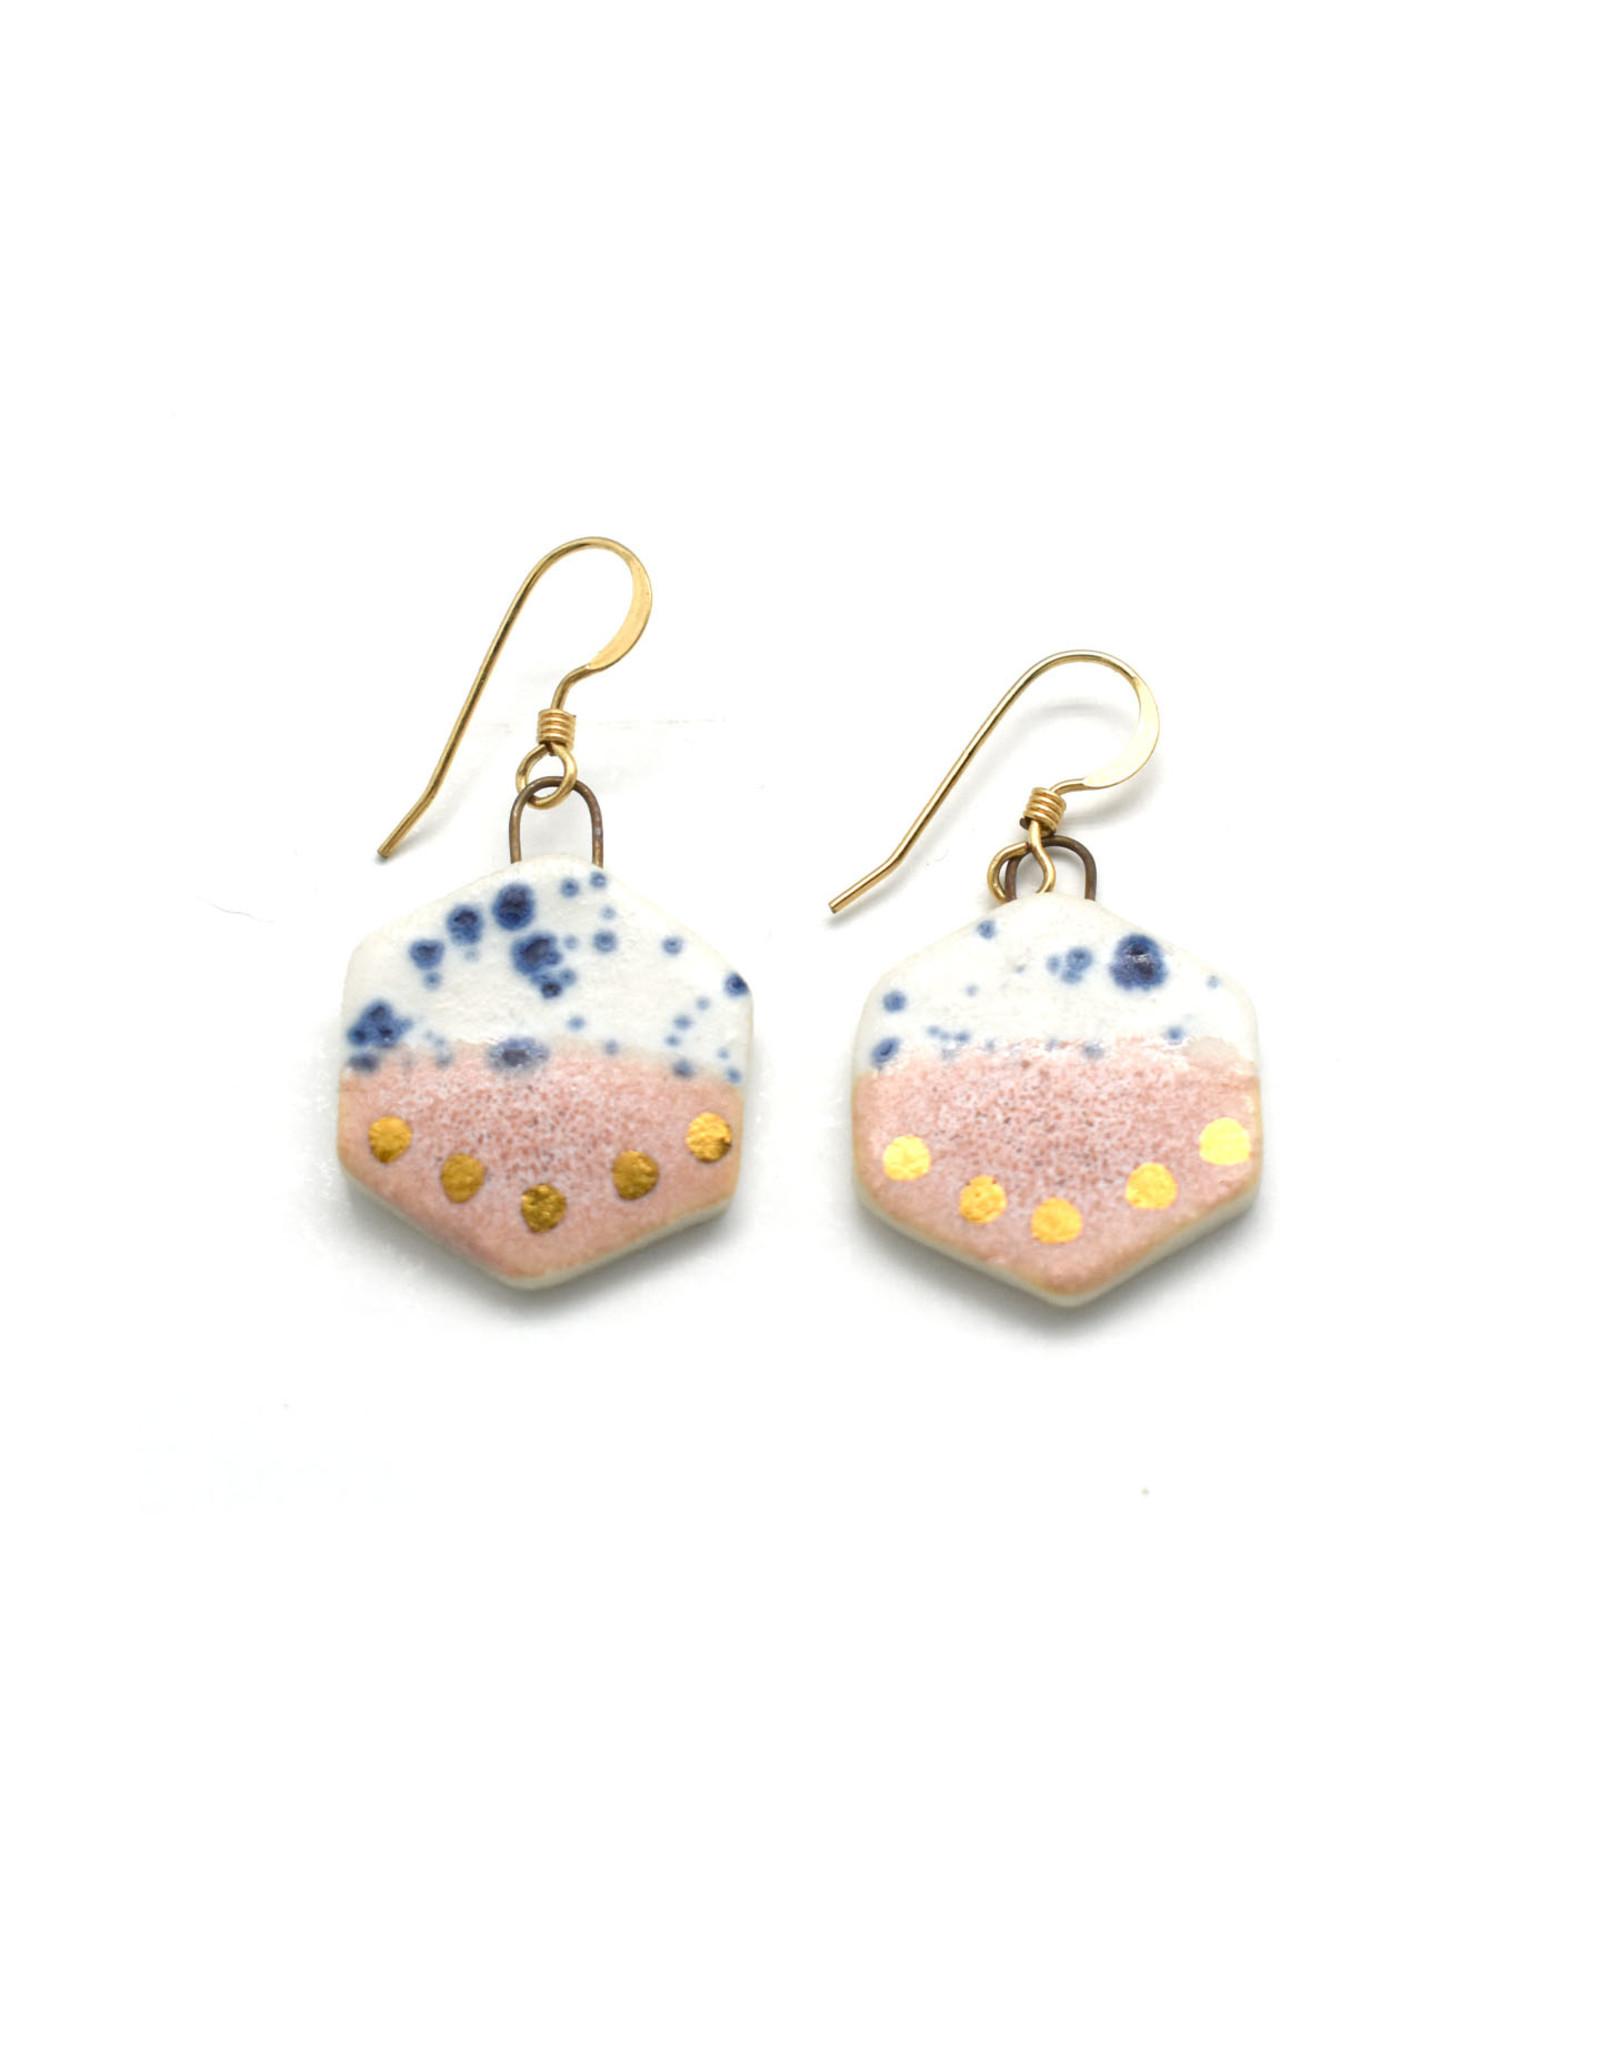 Small Hexagon Earrings - Gold/Rhubarb/Blue Speckle